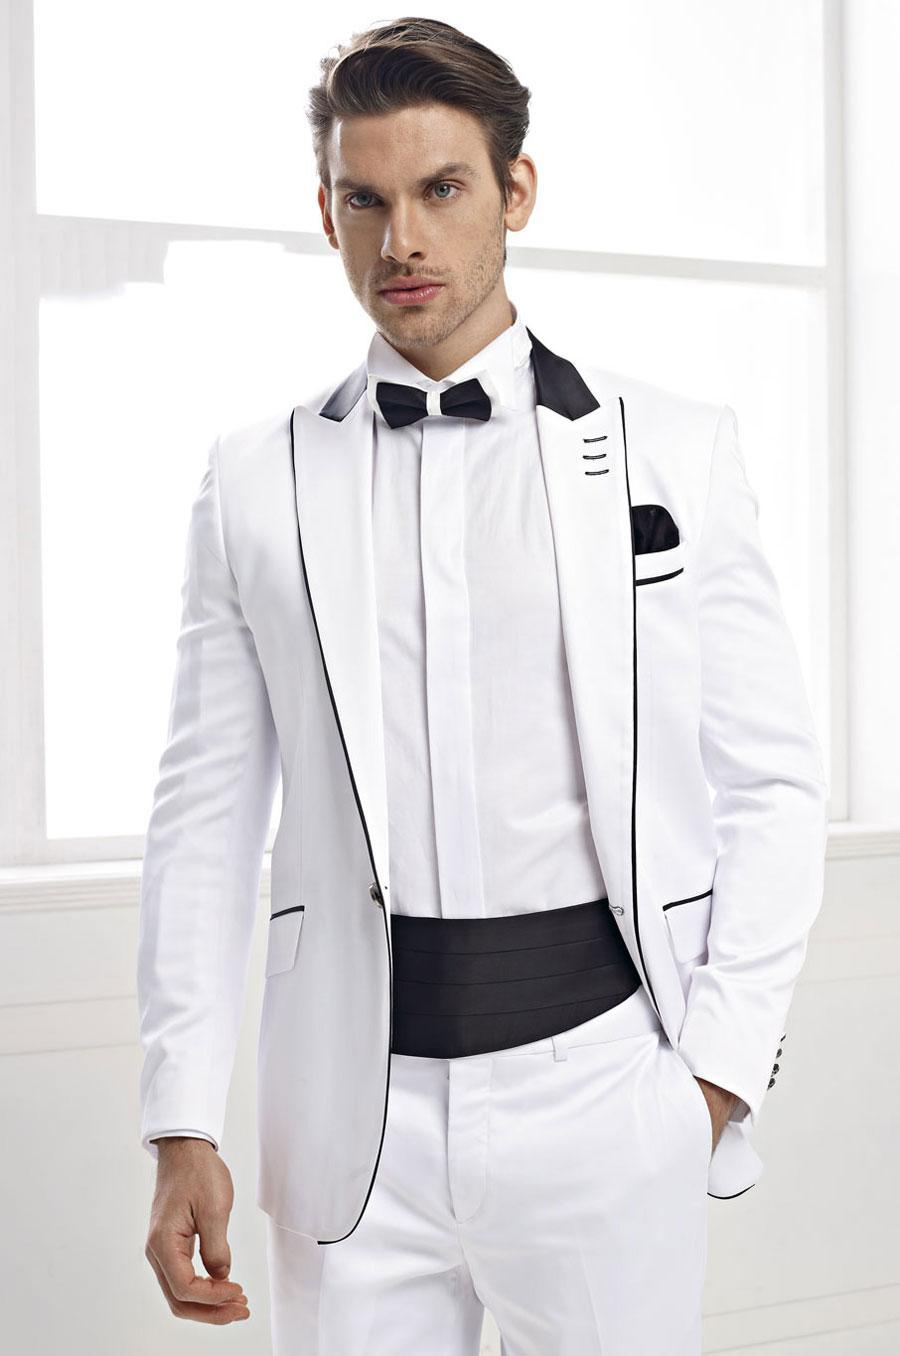 2015 Custom Made White Groom Suit Wedding Suit For Men Groomsman ...